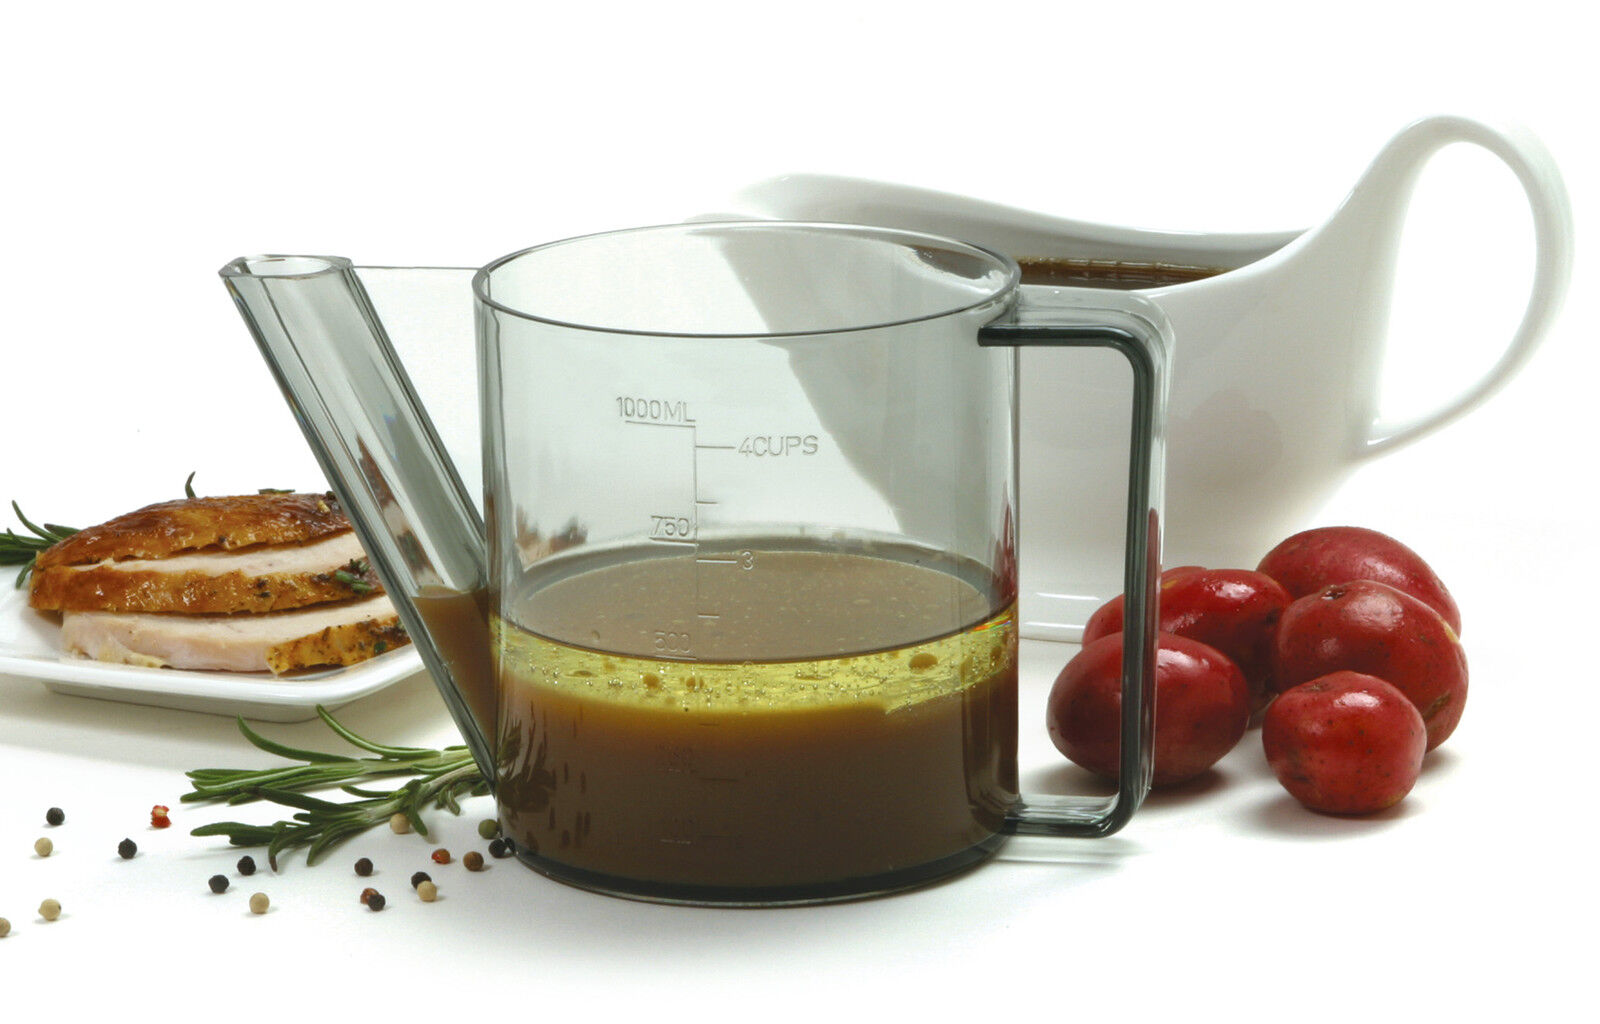 Norpro 3024 Gravy Fat Separator Meat Juice Measurer With Dripless Spout 4 Cup on sale